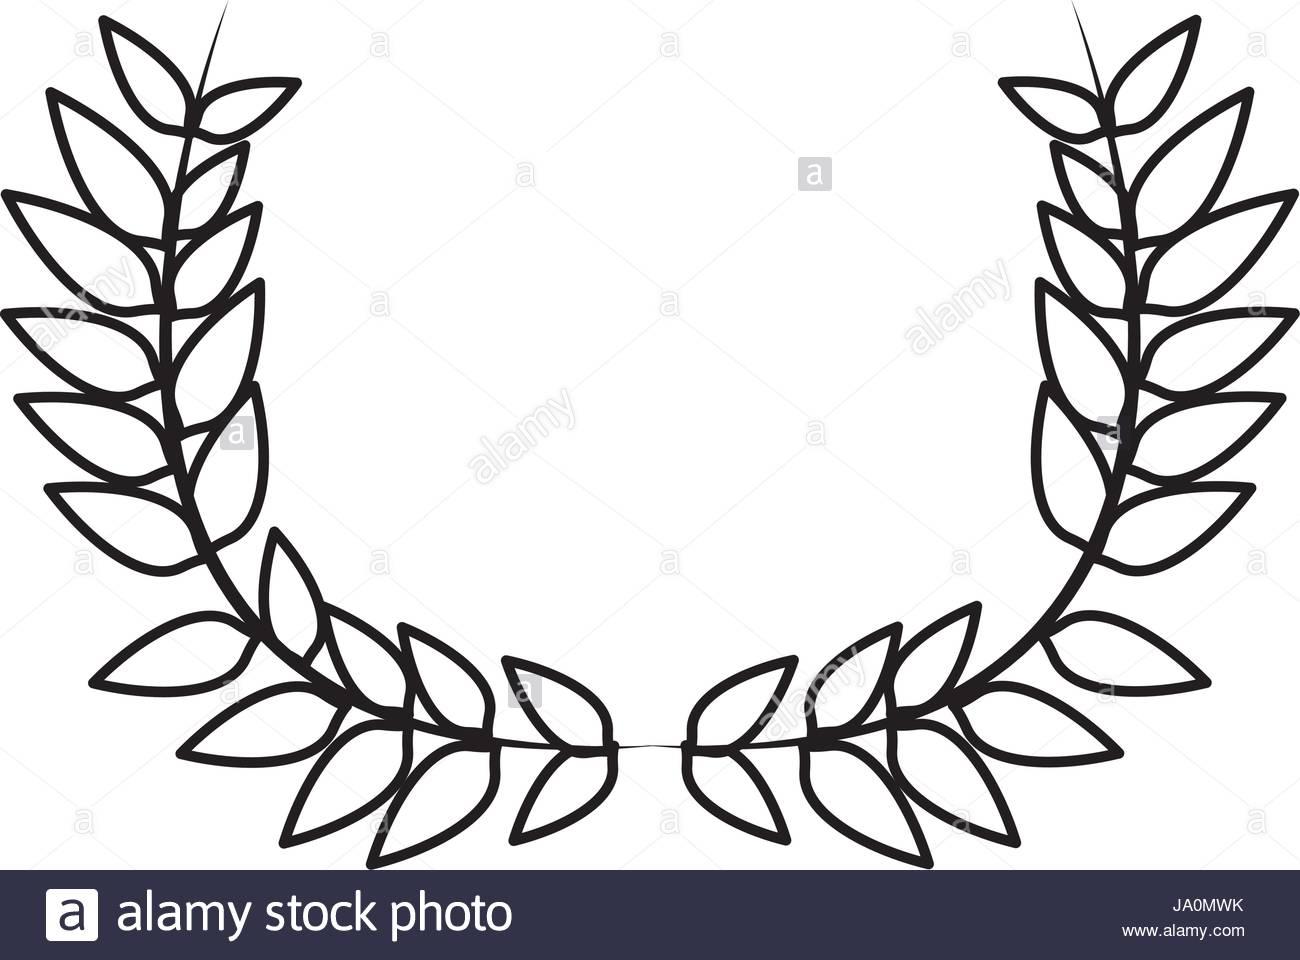 1300x960 Drawing Crown Half Flower Natural Decoration Laurel Leaves Stock